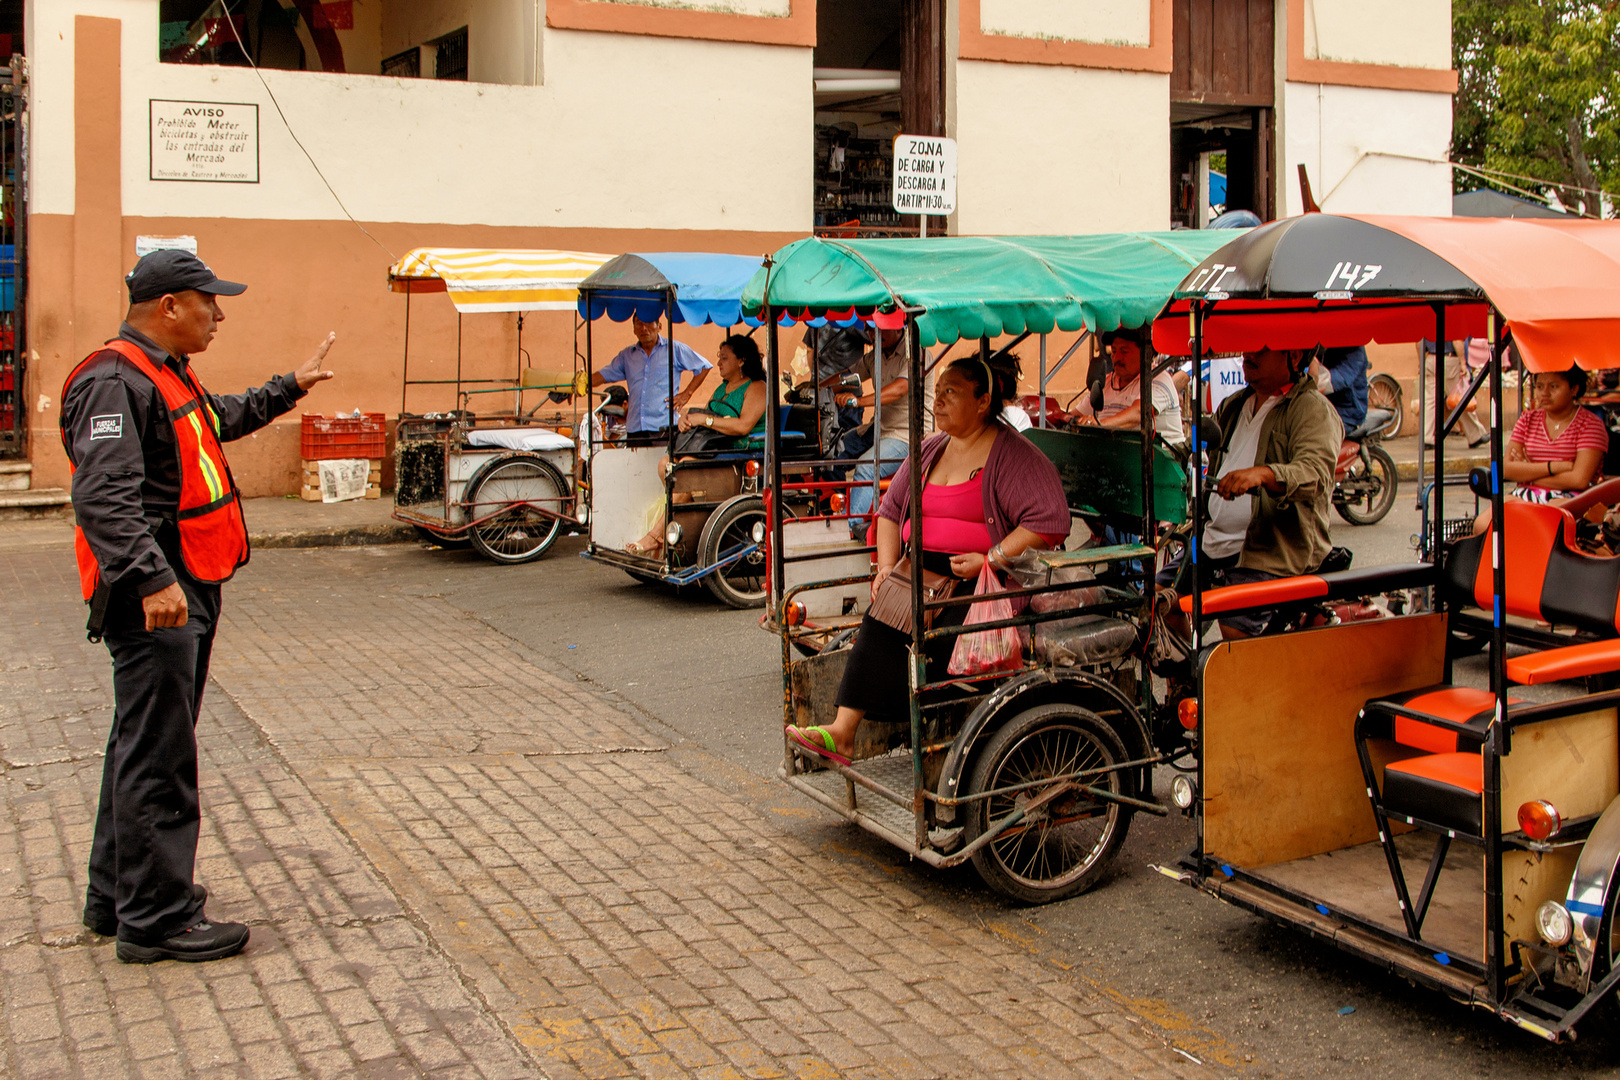 Der Tuktuk - Bändiger